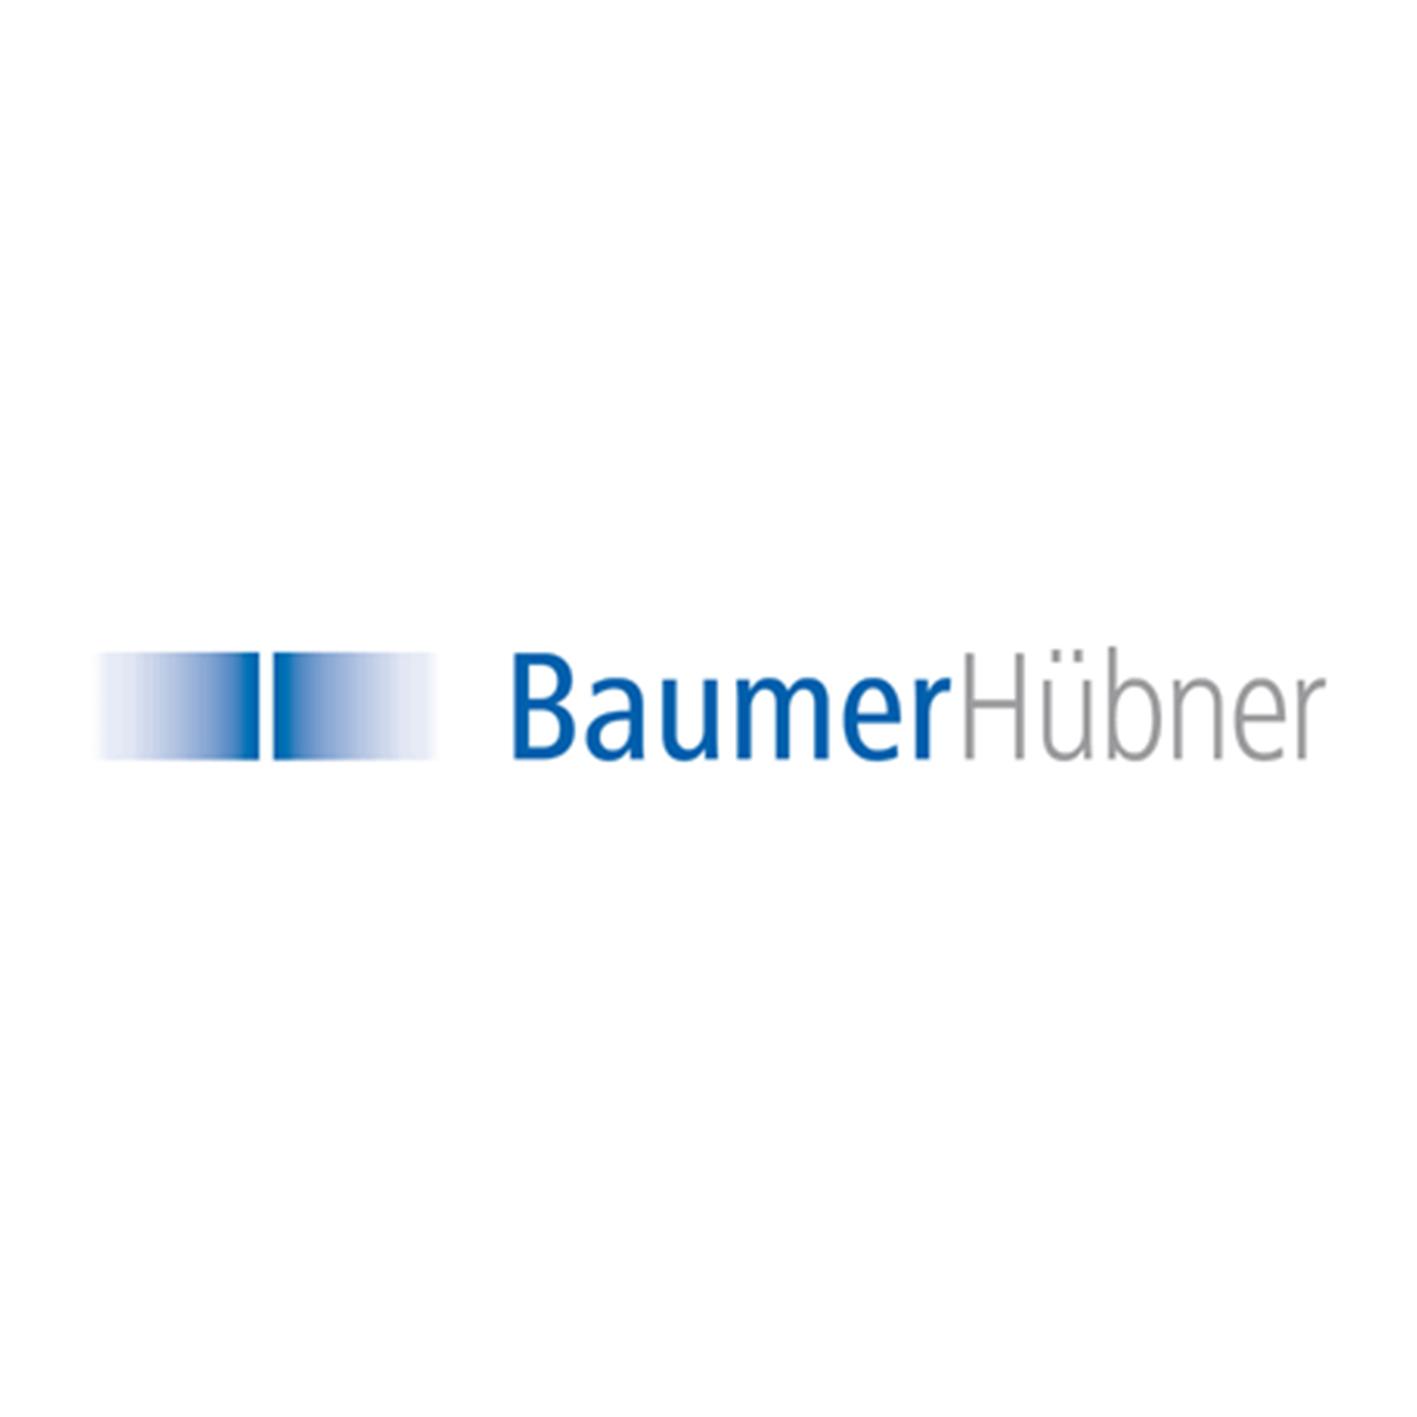 Baumer Hubner